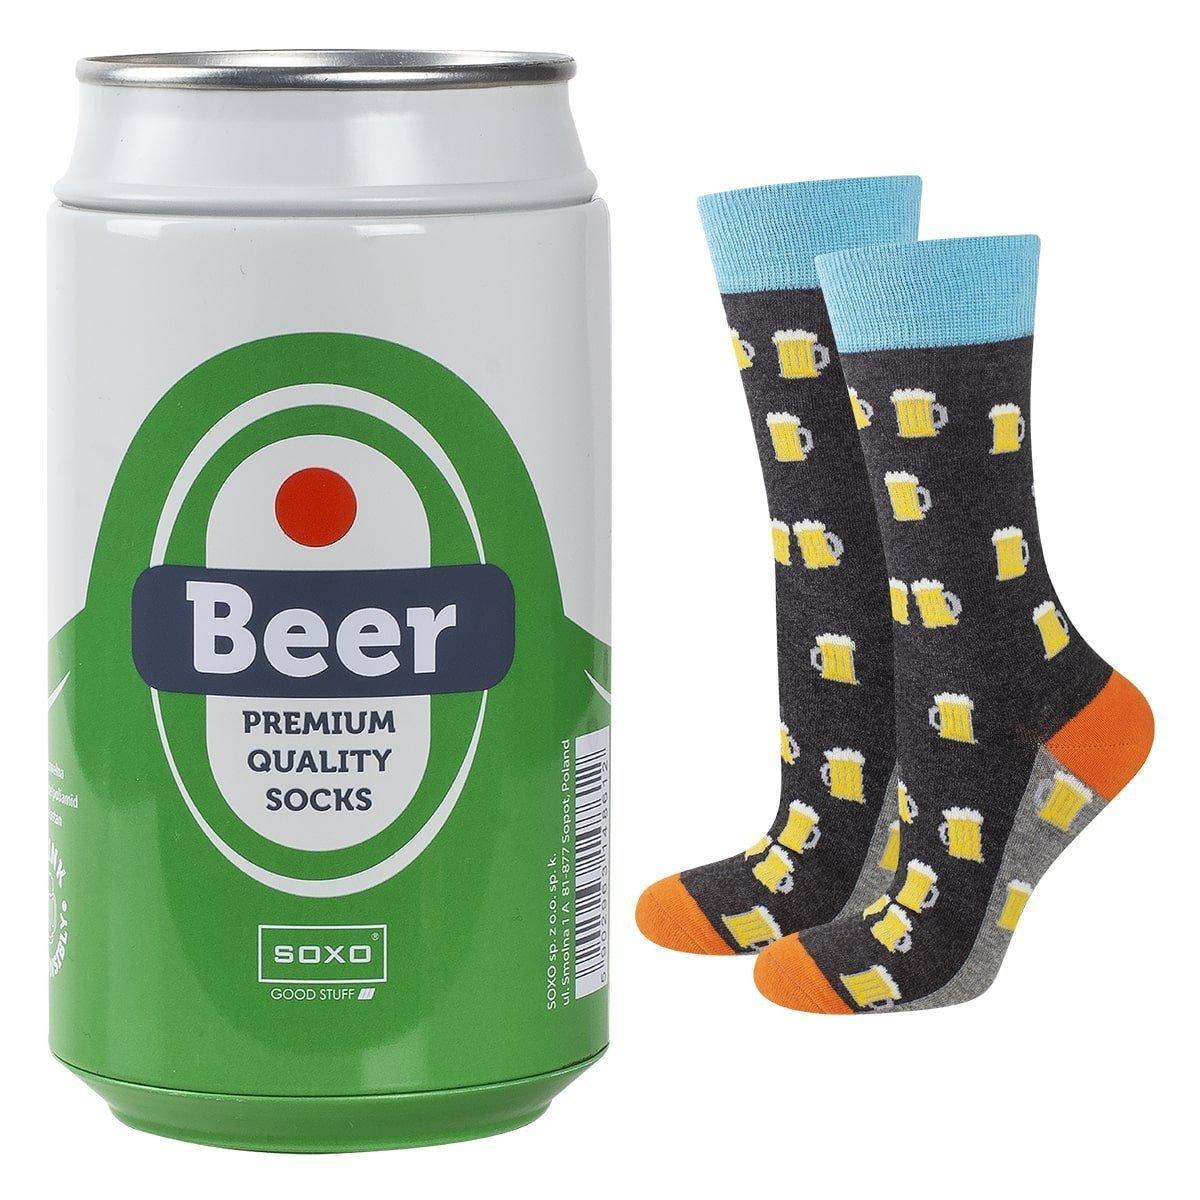 Beer - Pivo v plechu - Good stuff-DARGRA